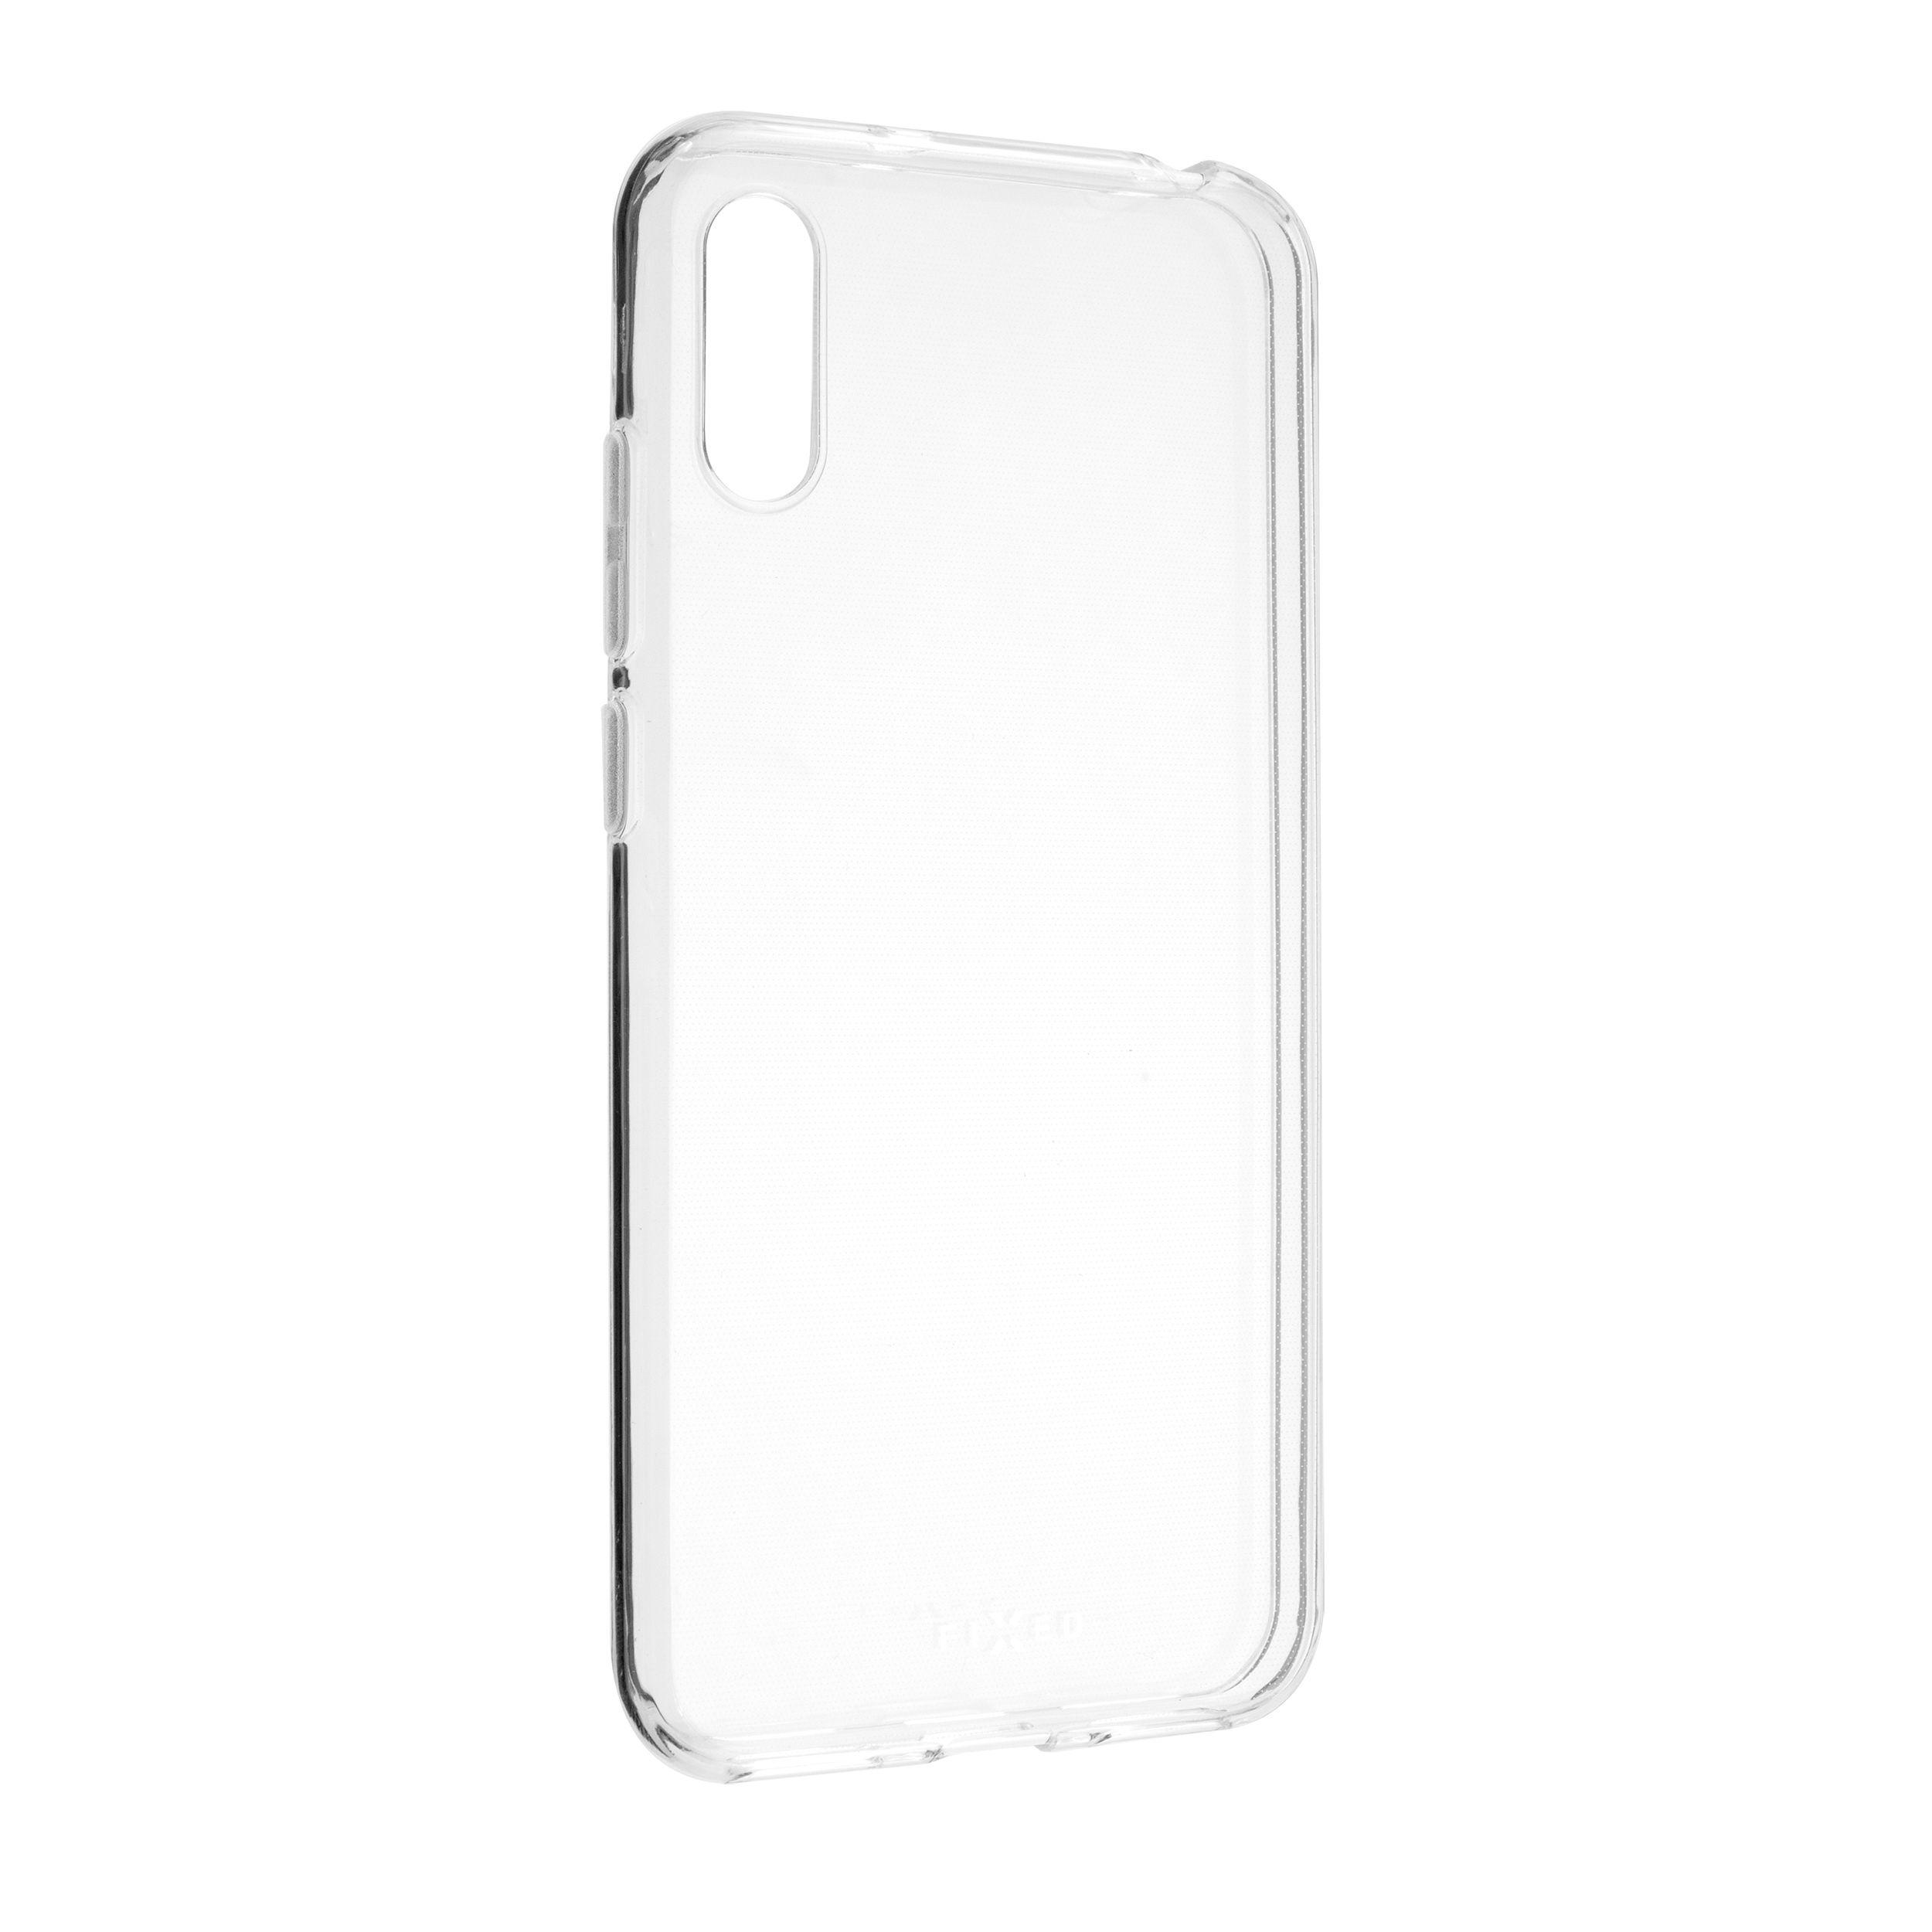 Ultratenké TPU gelové pouzdro FIXED Skin pro Huawei Y6 (2019), 0,6 mm, čiré